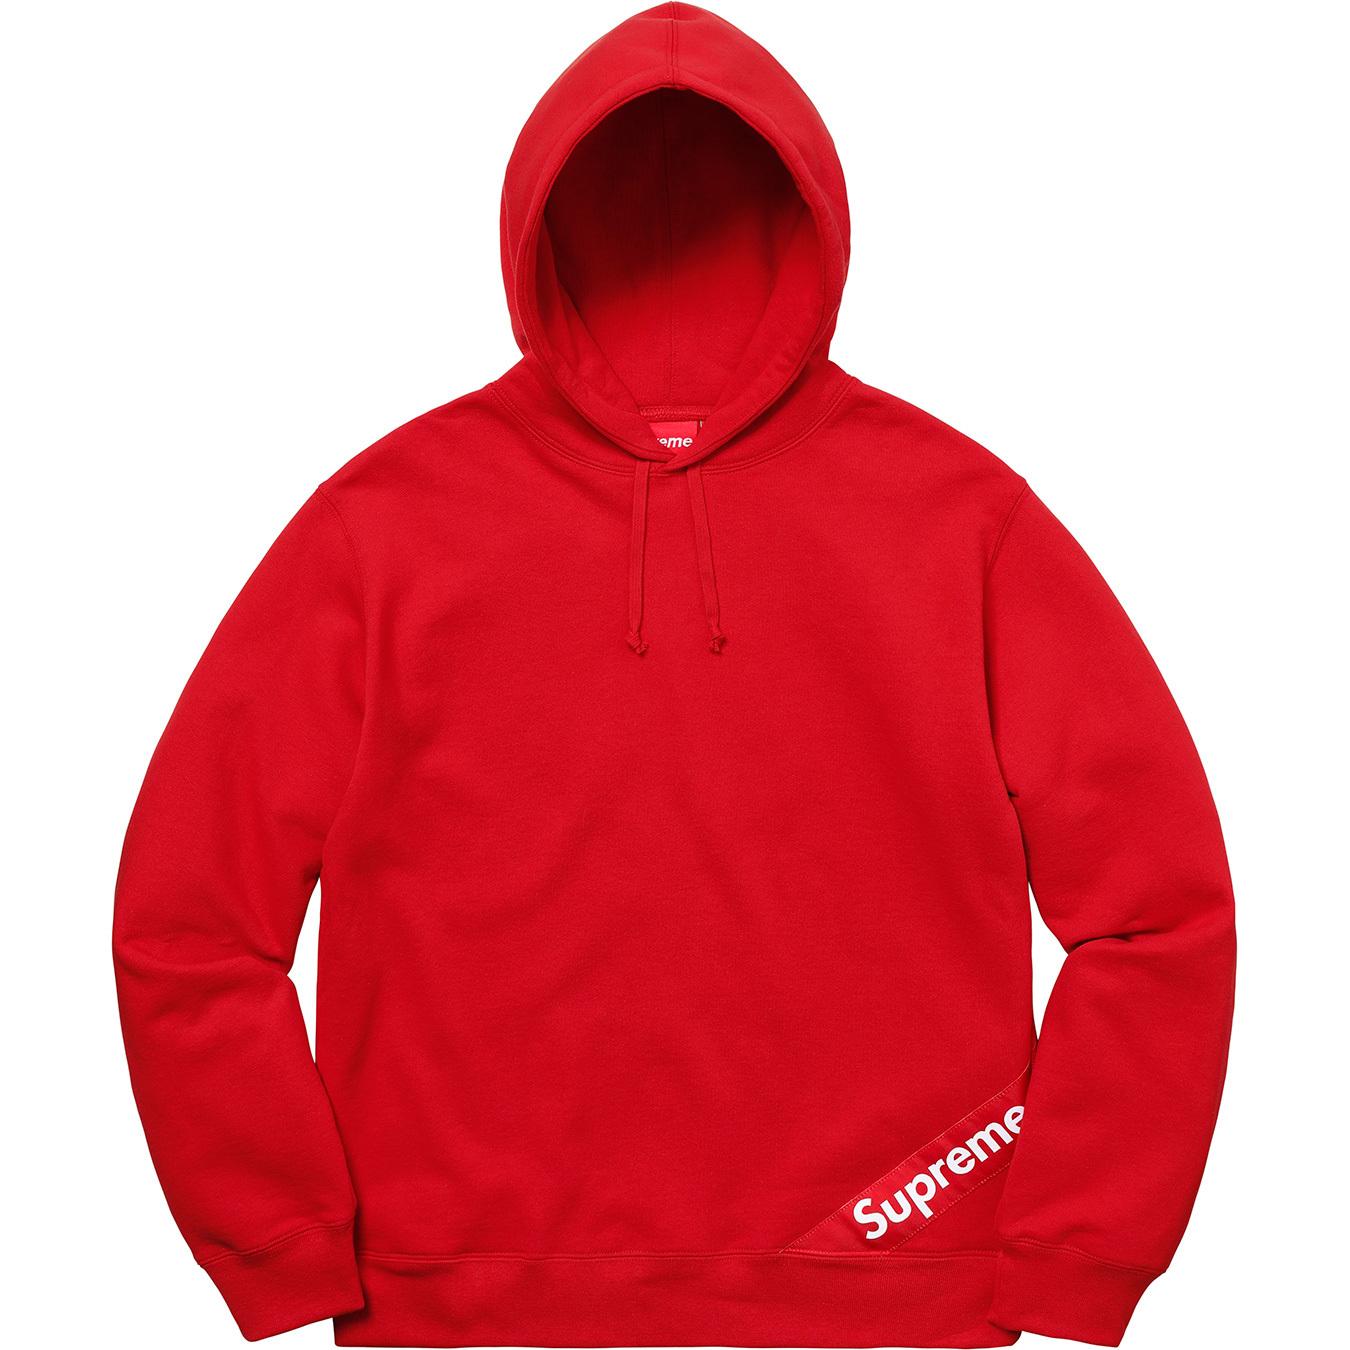 Details Supreme Corner Label Hooded Sweatshirt Supreme Community [ 1350 x 1350 Pixel ]